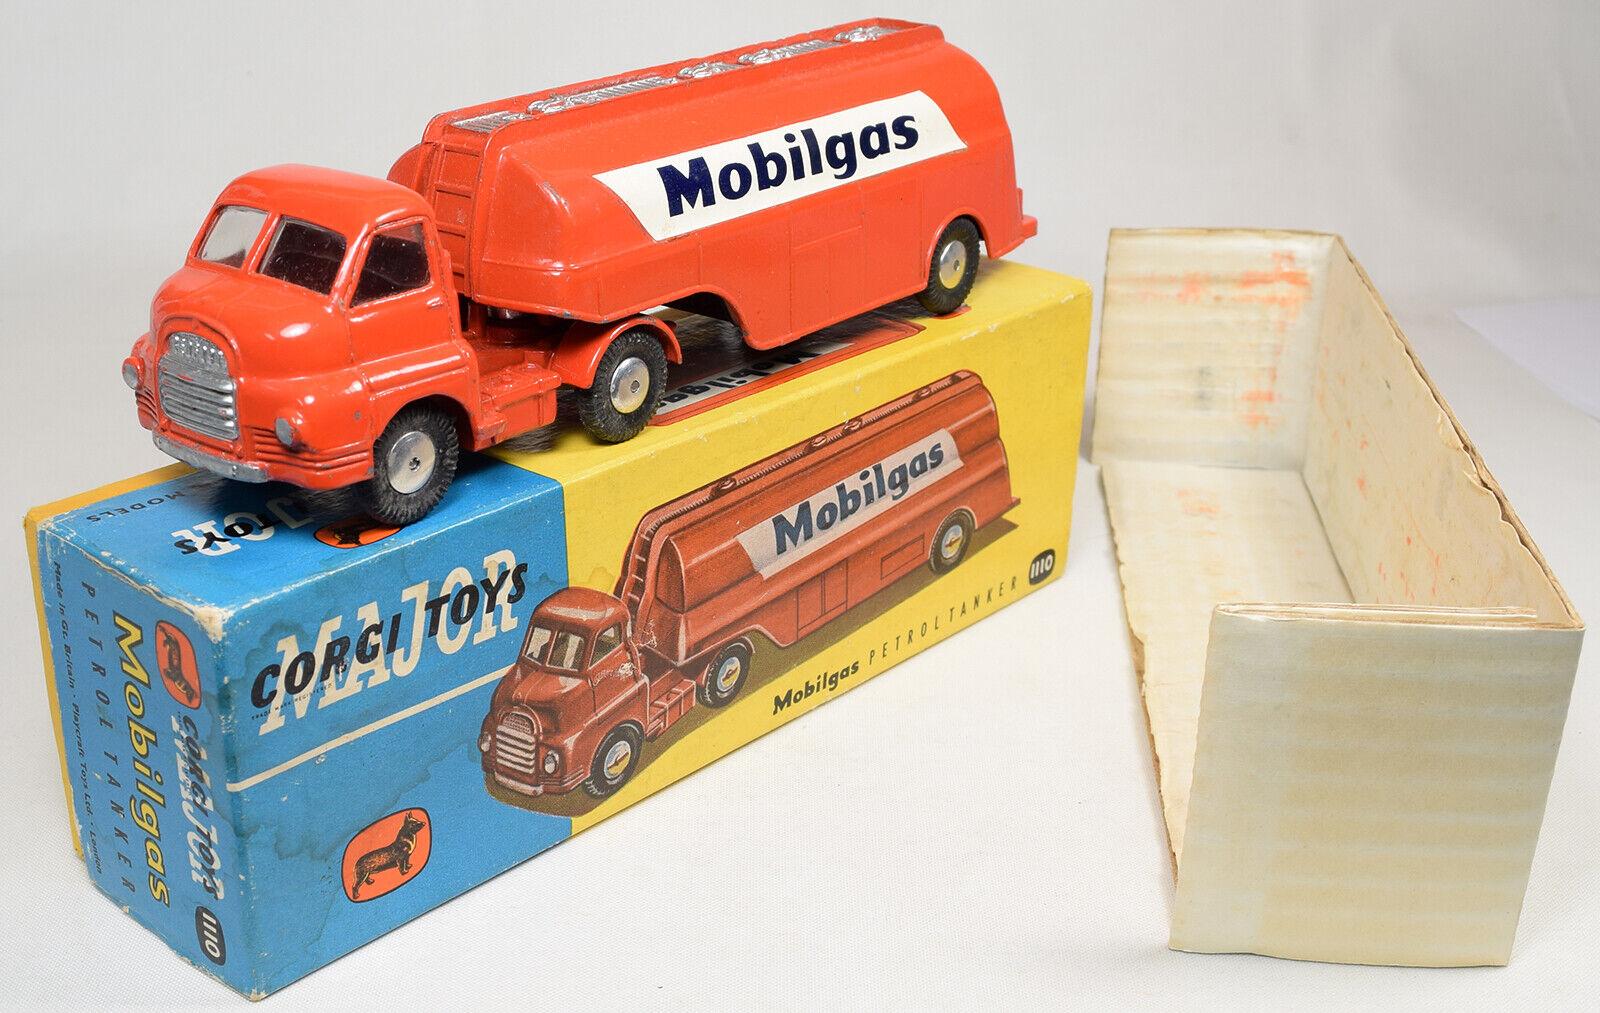 1959 CORGI  1110 MOBILGAS BEDFORD S TANKER EXC W  VG+ CARDED BOX-A SCARCE Modelll